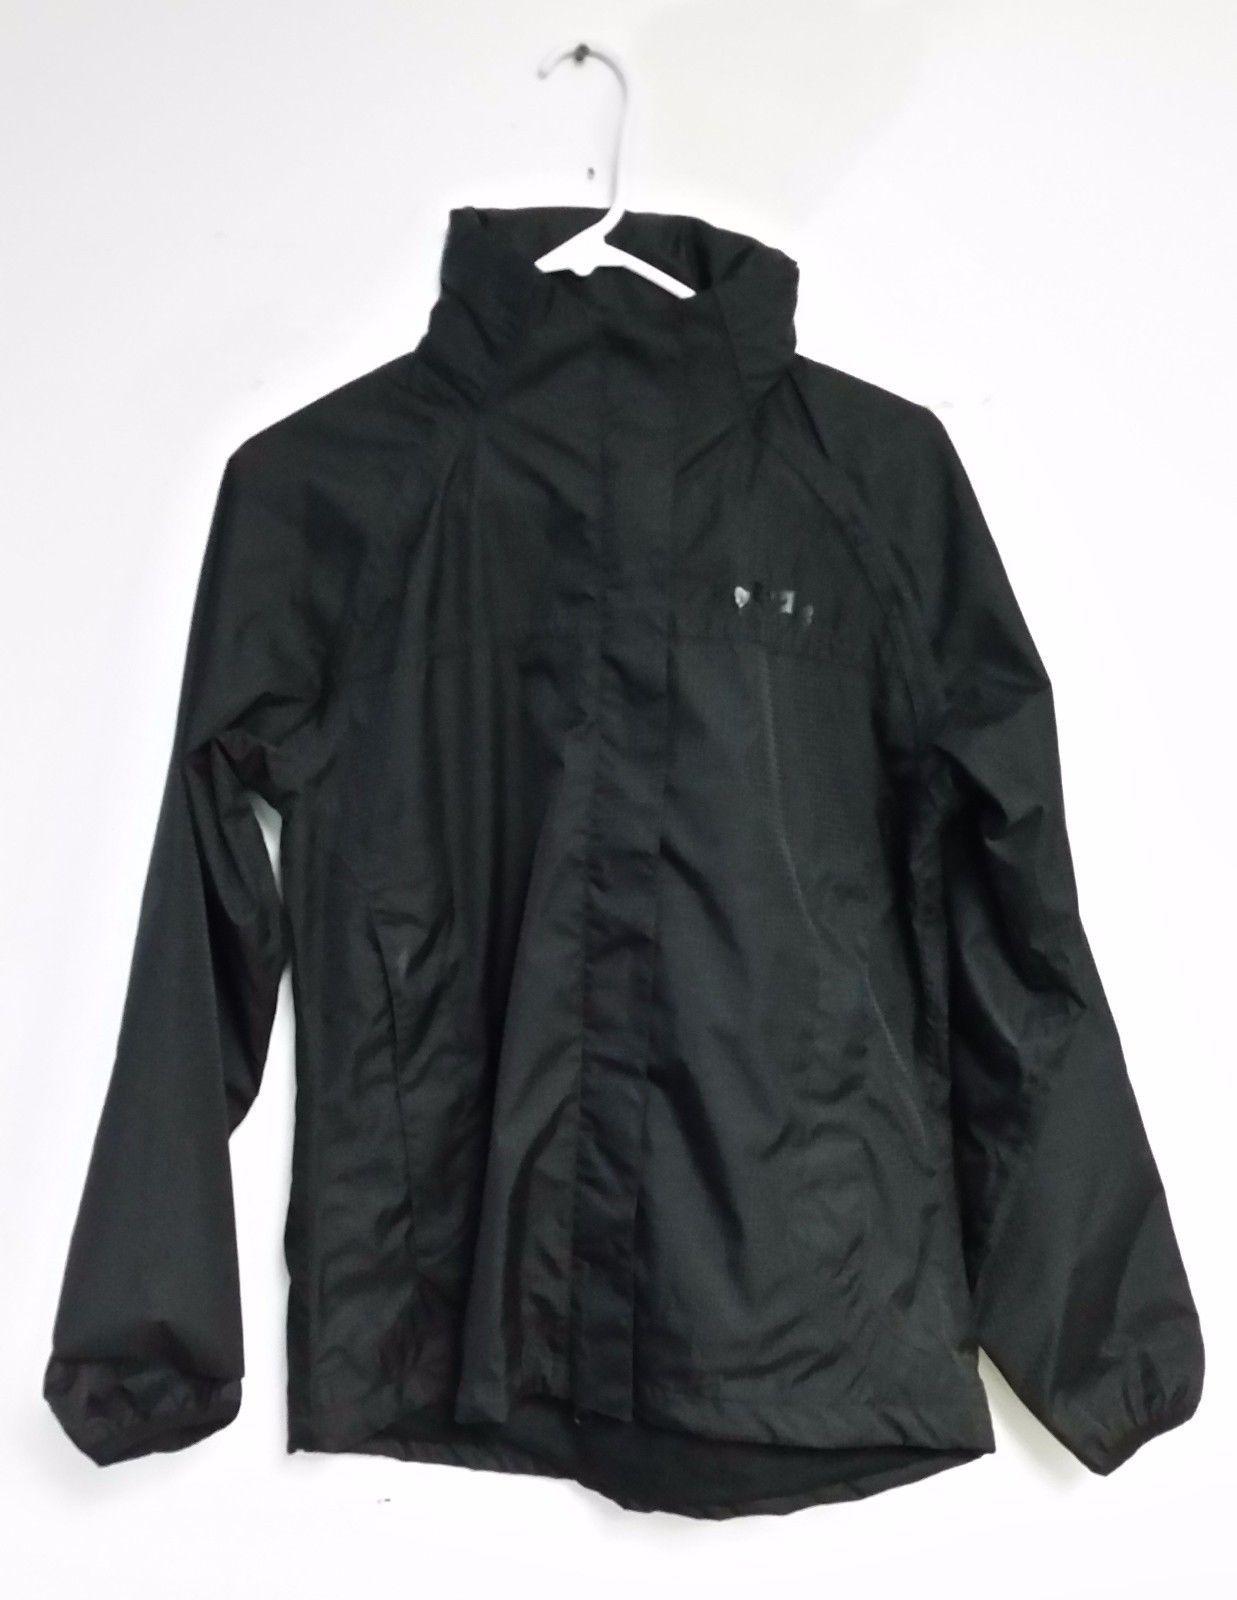 Jackets 47268: Ladies Amazon Rain Shell Jacket -> BUY IT NOW ONLY: $52.5 on eBay!